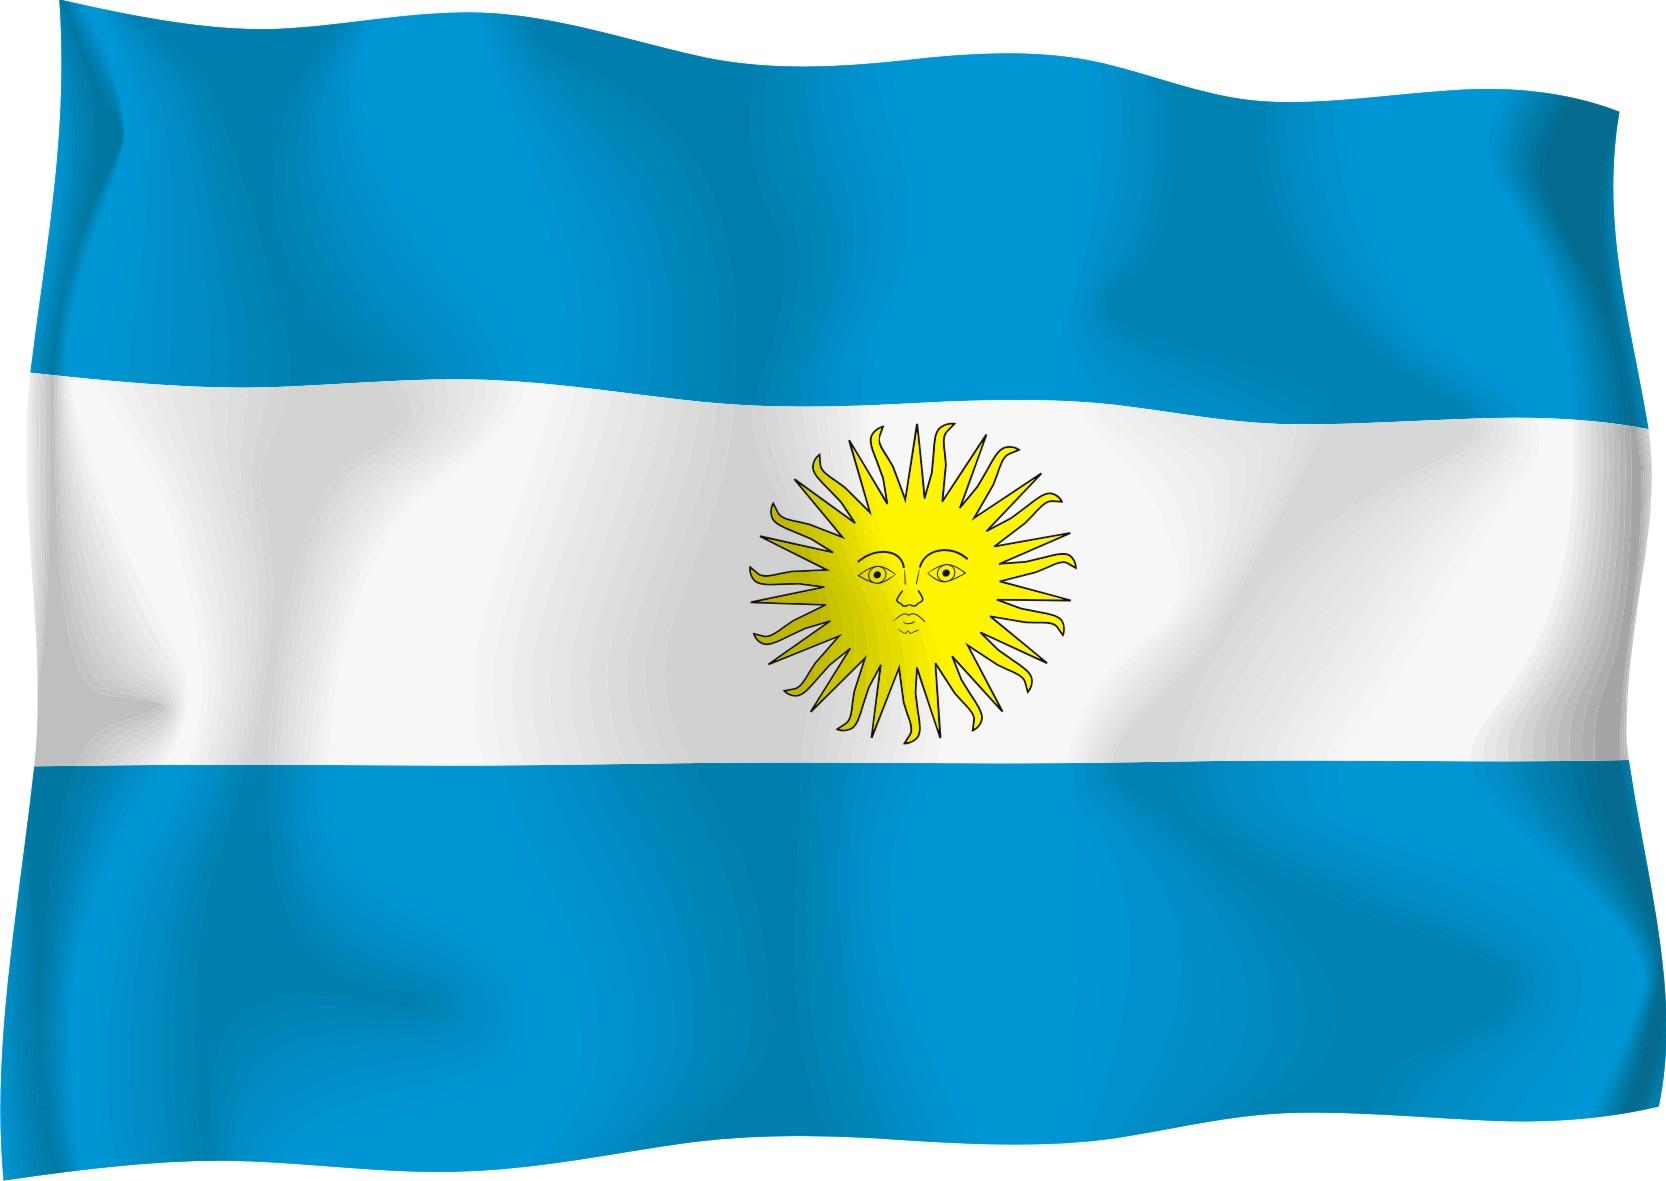 1666x1181 Argentina Clipart Argentina Flag Clipart